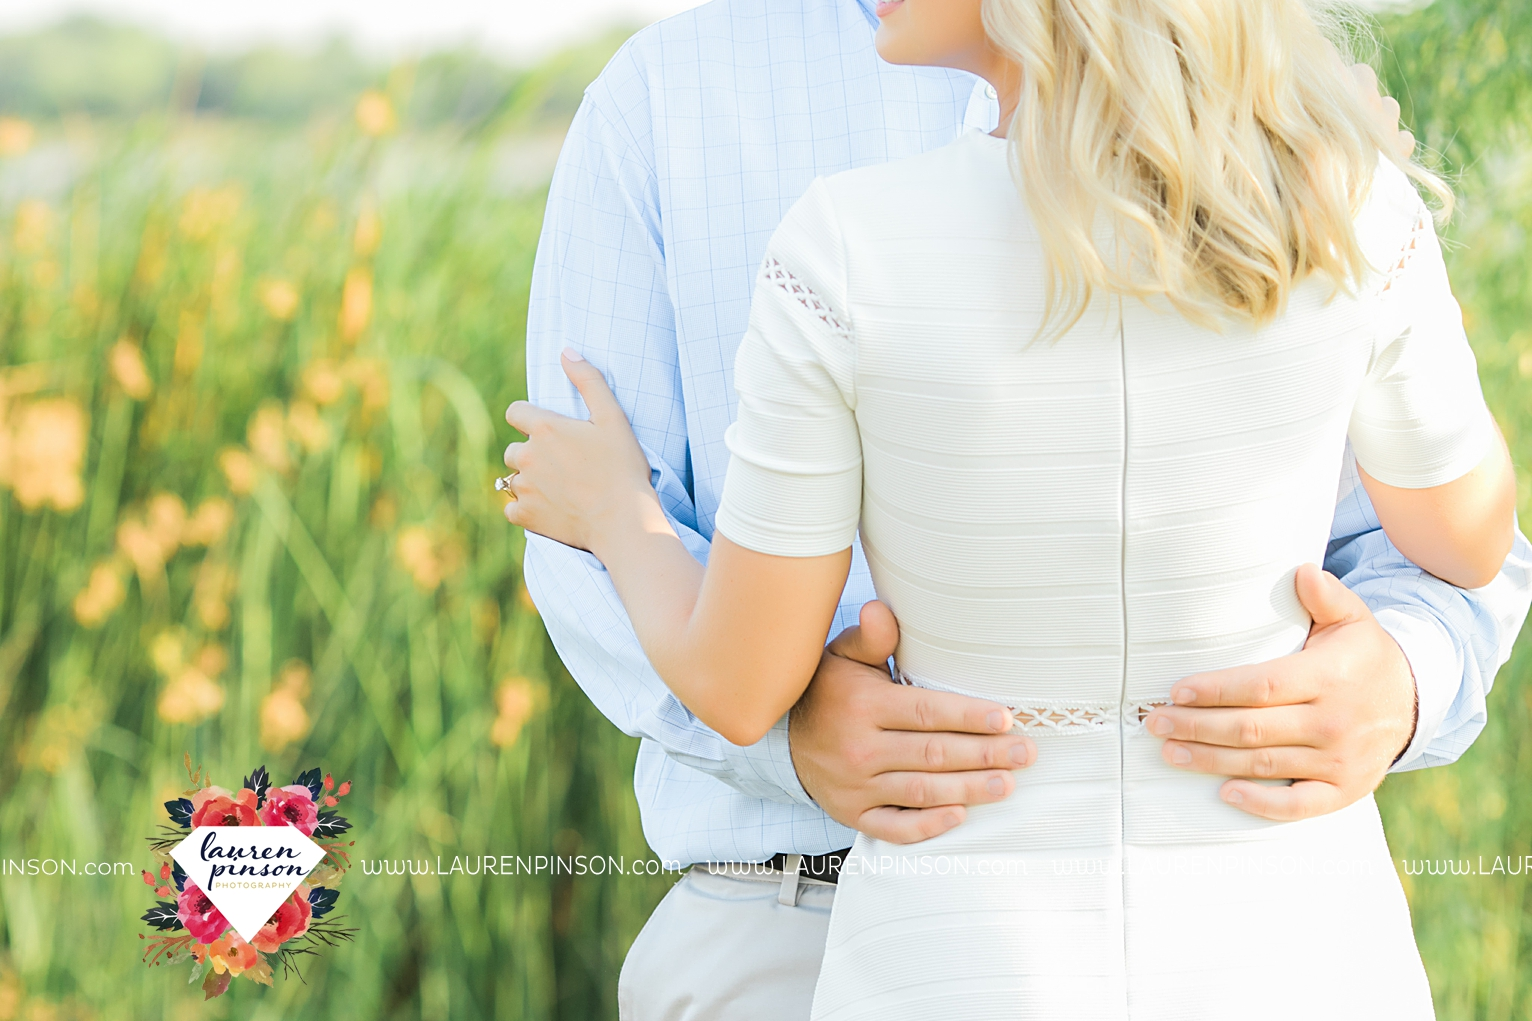 wichita-falls-texas-wedding-photographer-beachy-engagement-session-at-lake-wichita_2918.jpg